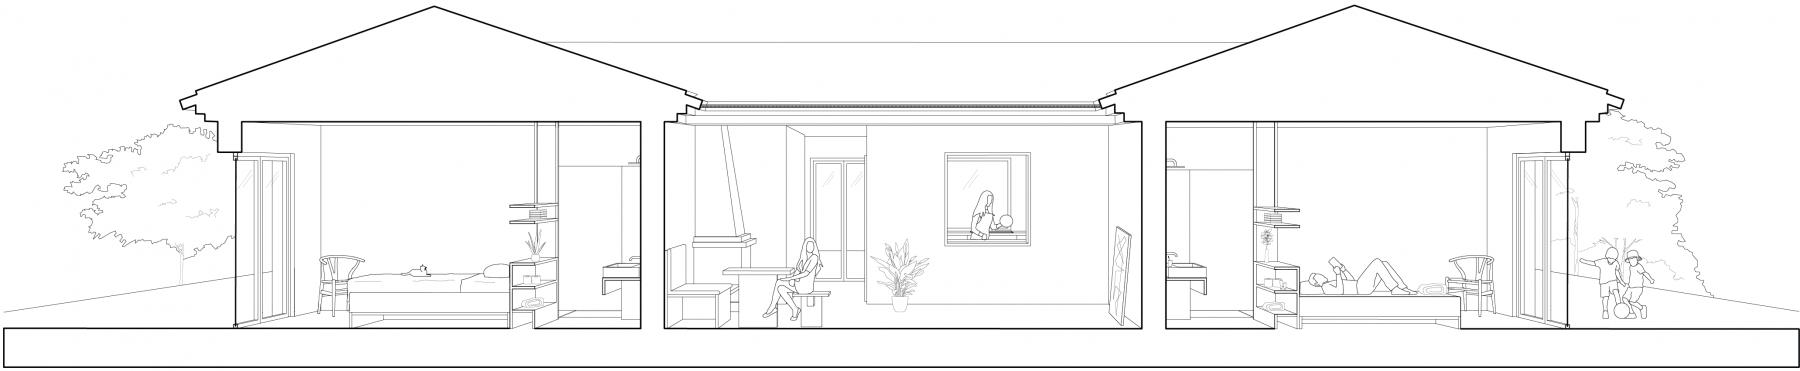 dc ad lua nua architecture section